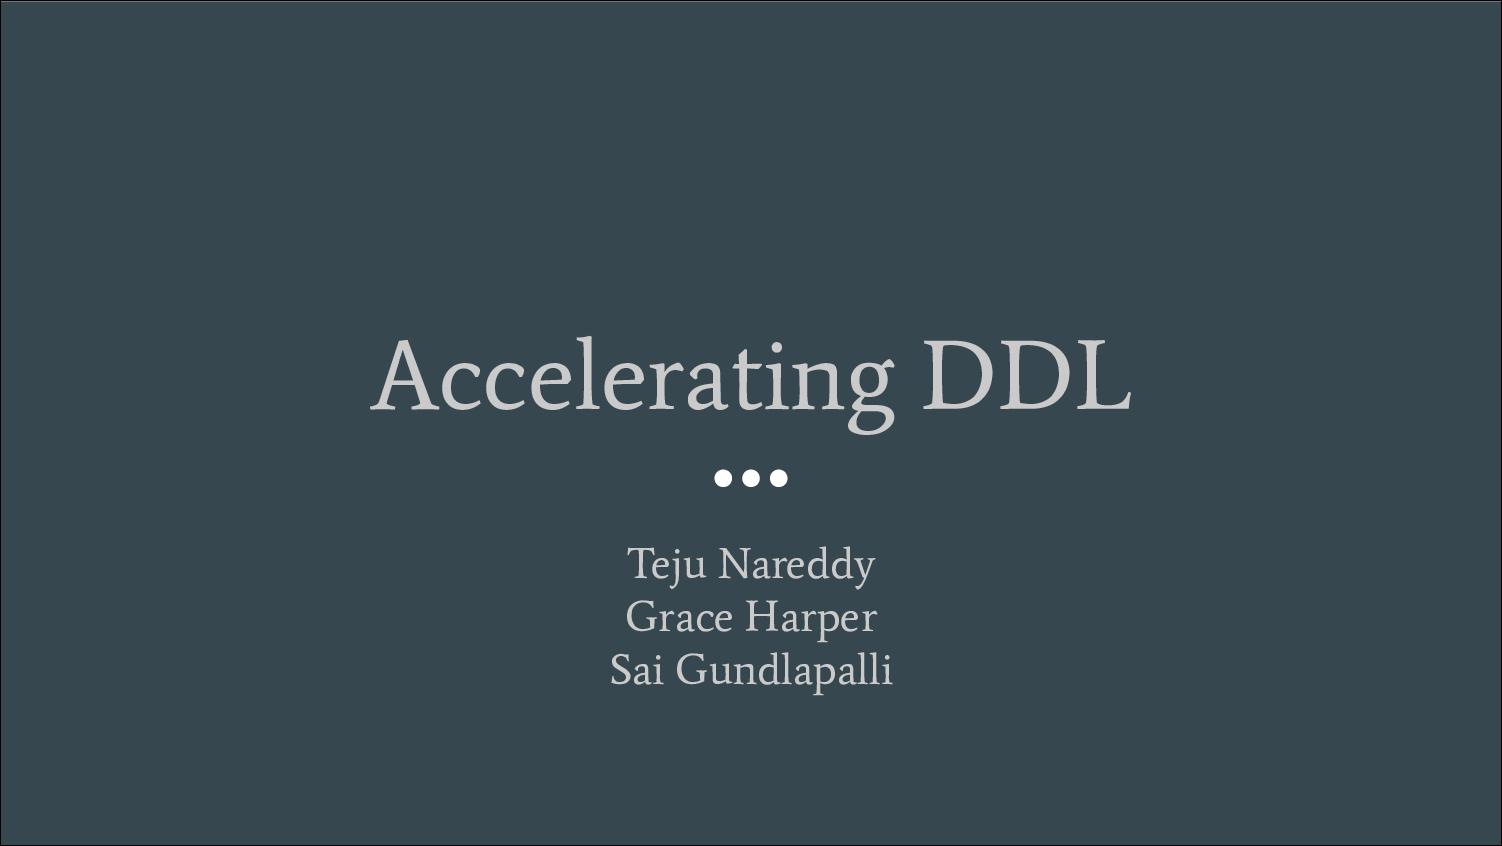 [PRESENTATION] Accelerating DDL Operations